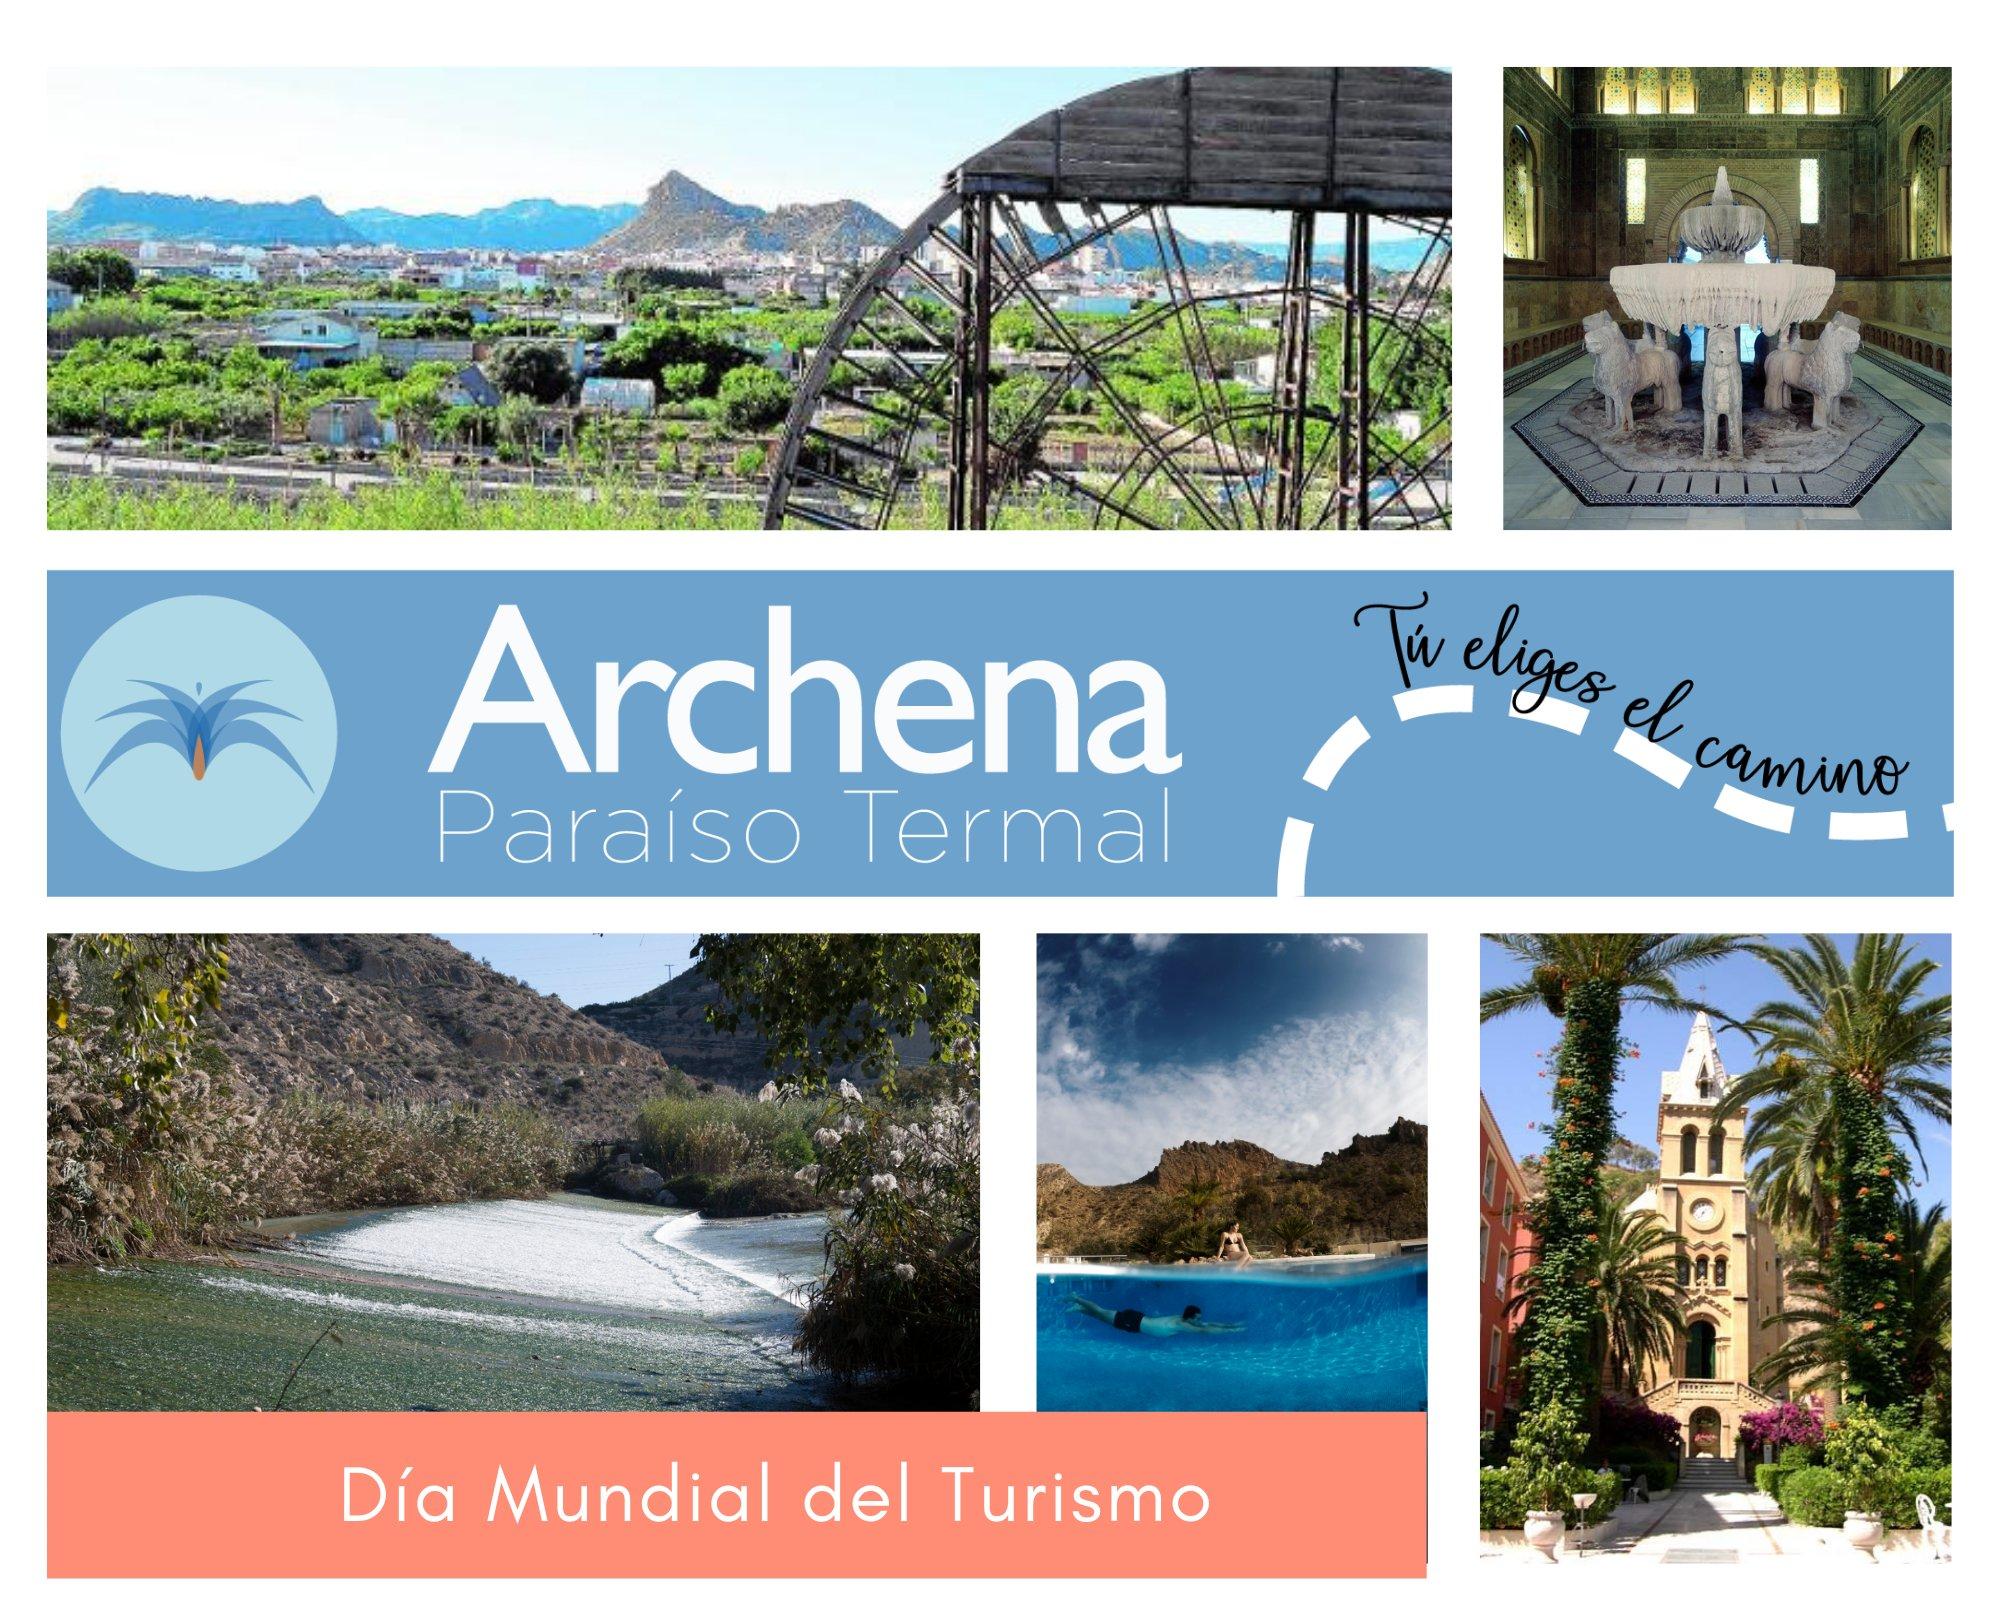 Oficina de Turismo de Archena